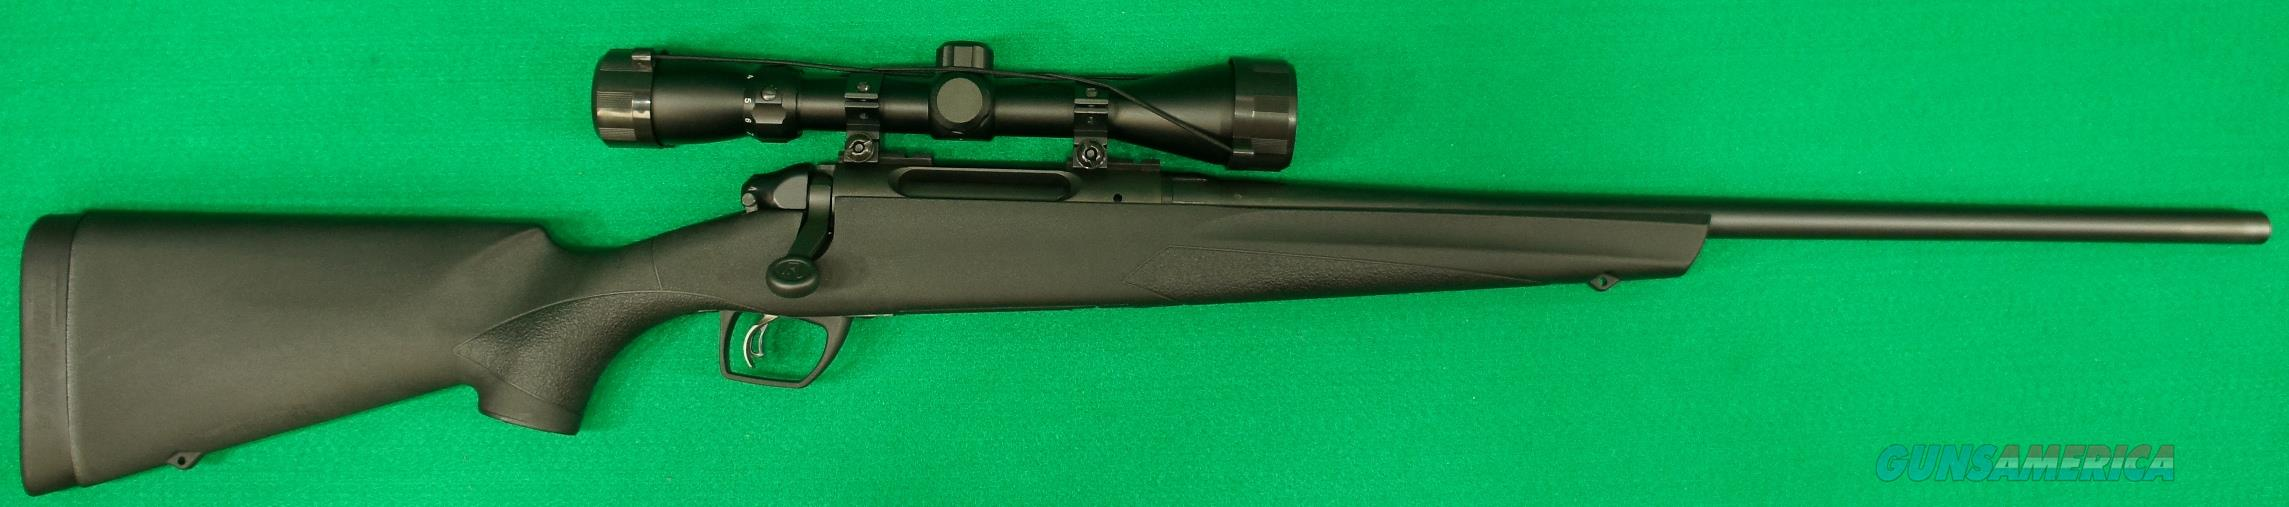 783 Combo 243Win 22In 85842  Guns > Rifles > Remington Rifles - Modern > Bolt Action Non-Model 700